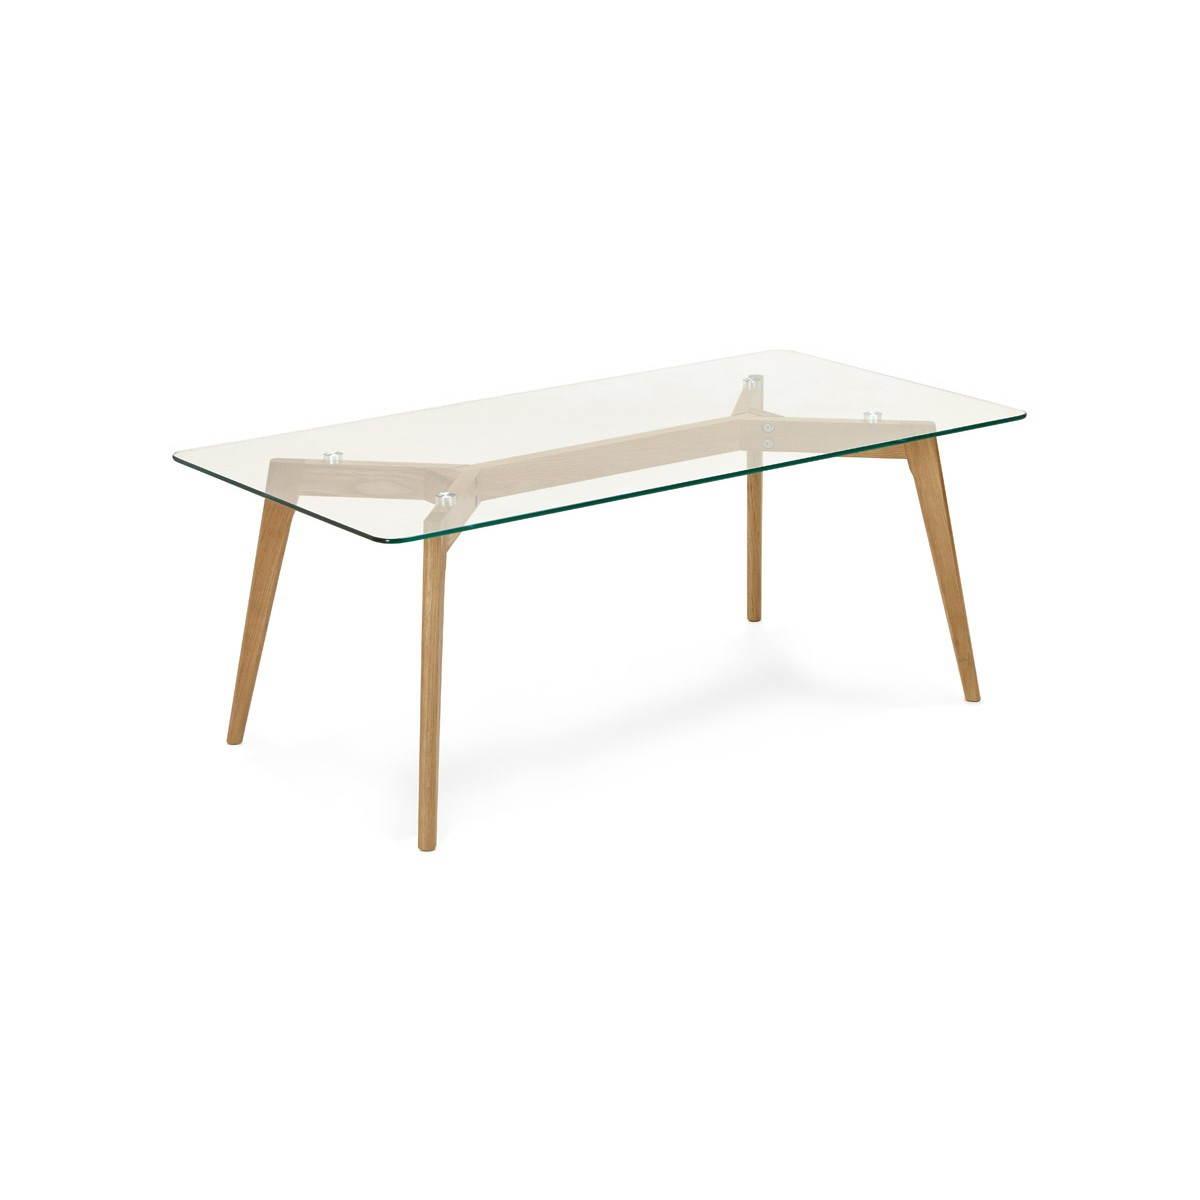 table basse rectangulaire style scandinave henna en verre et chene transparent amp story 3988